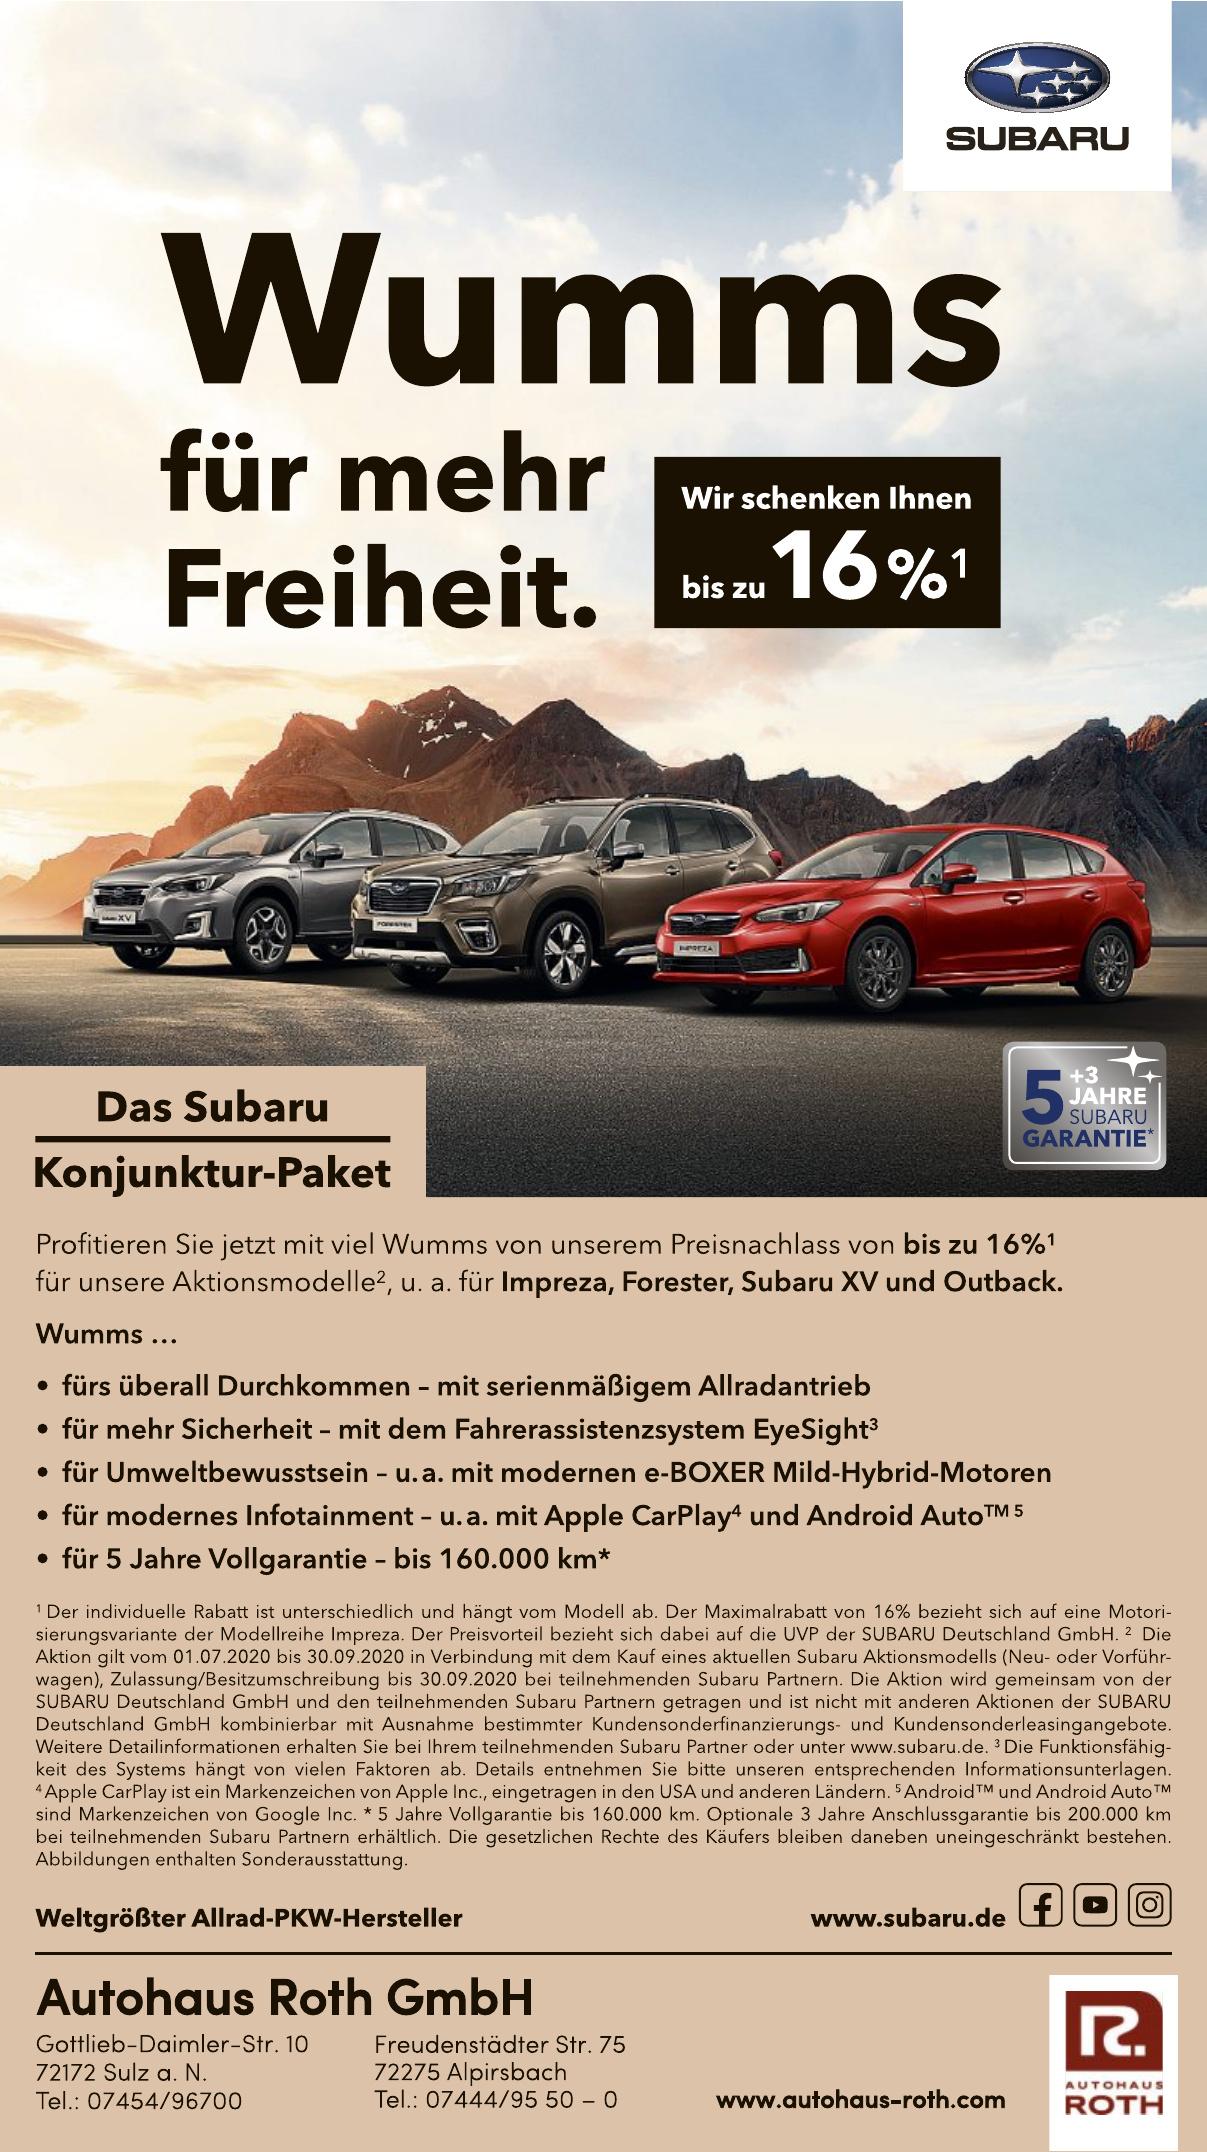 Autohaus Roth GmbH